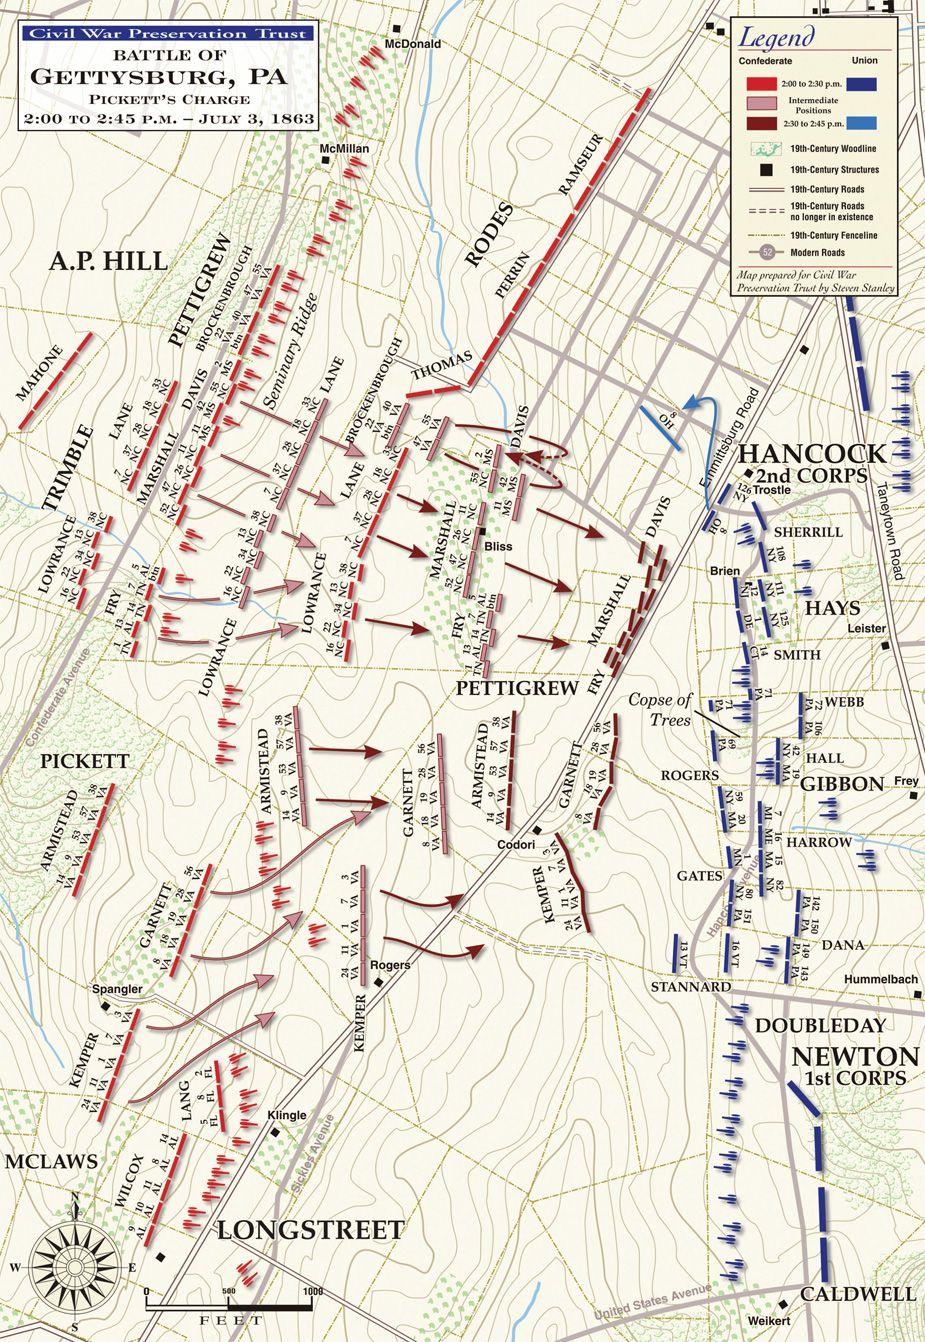 Gettysburg College Map Gettysburg   Pickett's Charge, July 3, 1863   2:00   2:30PM  Gettysburg College Map